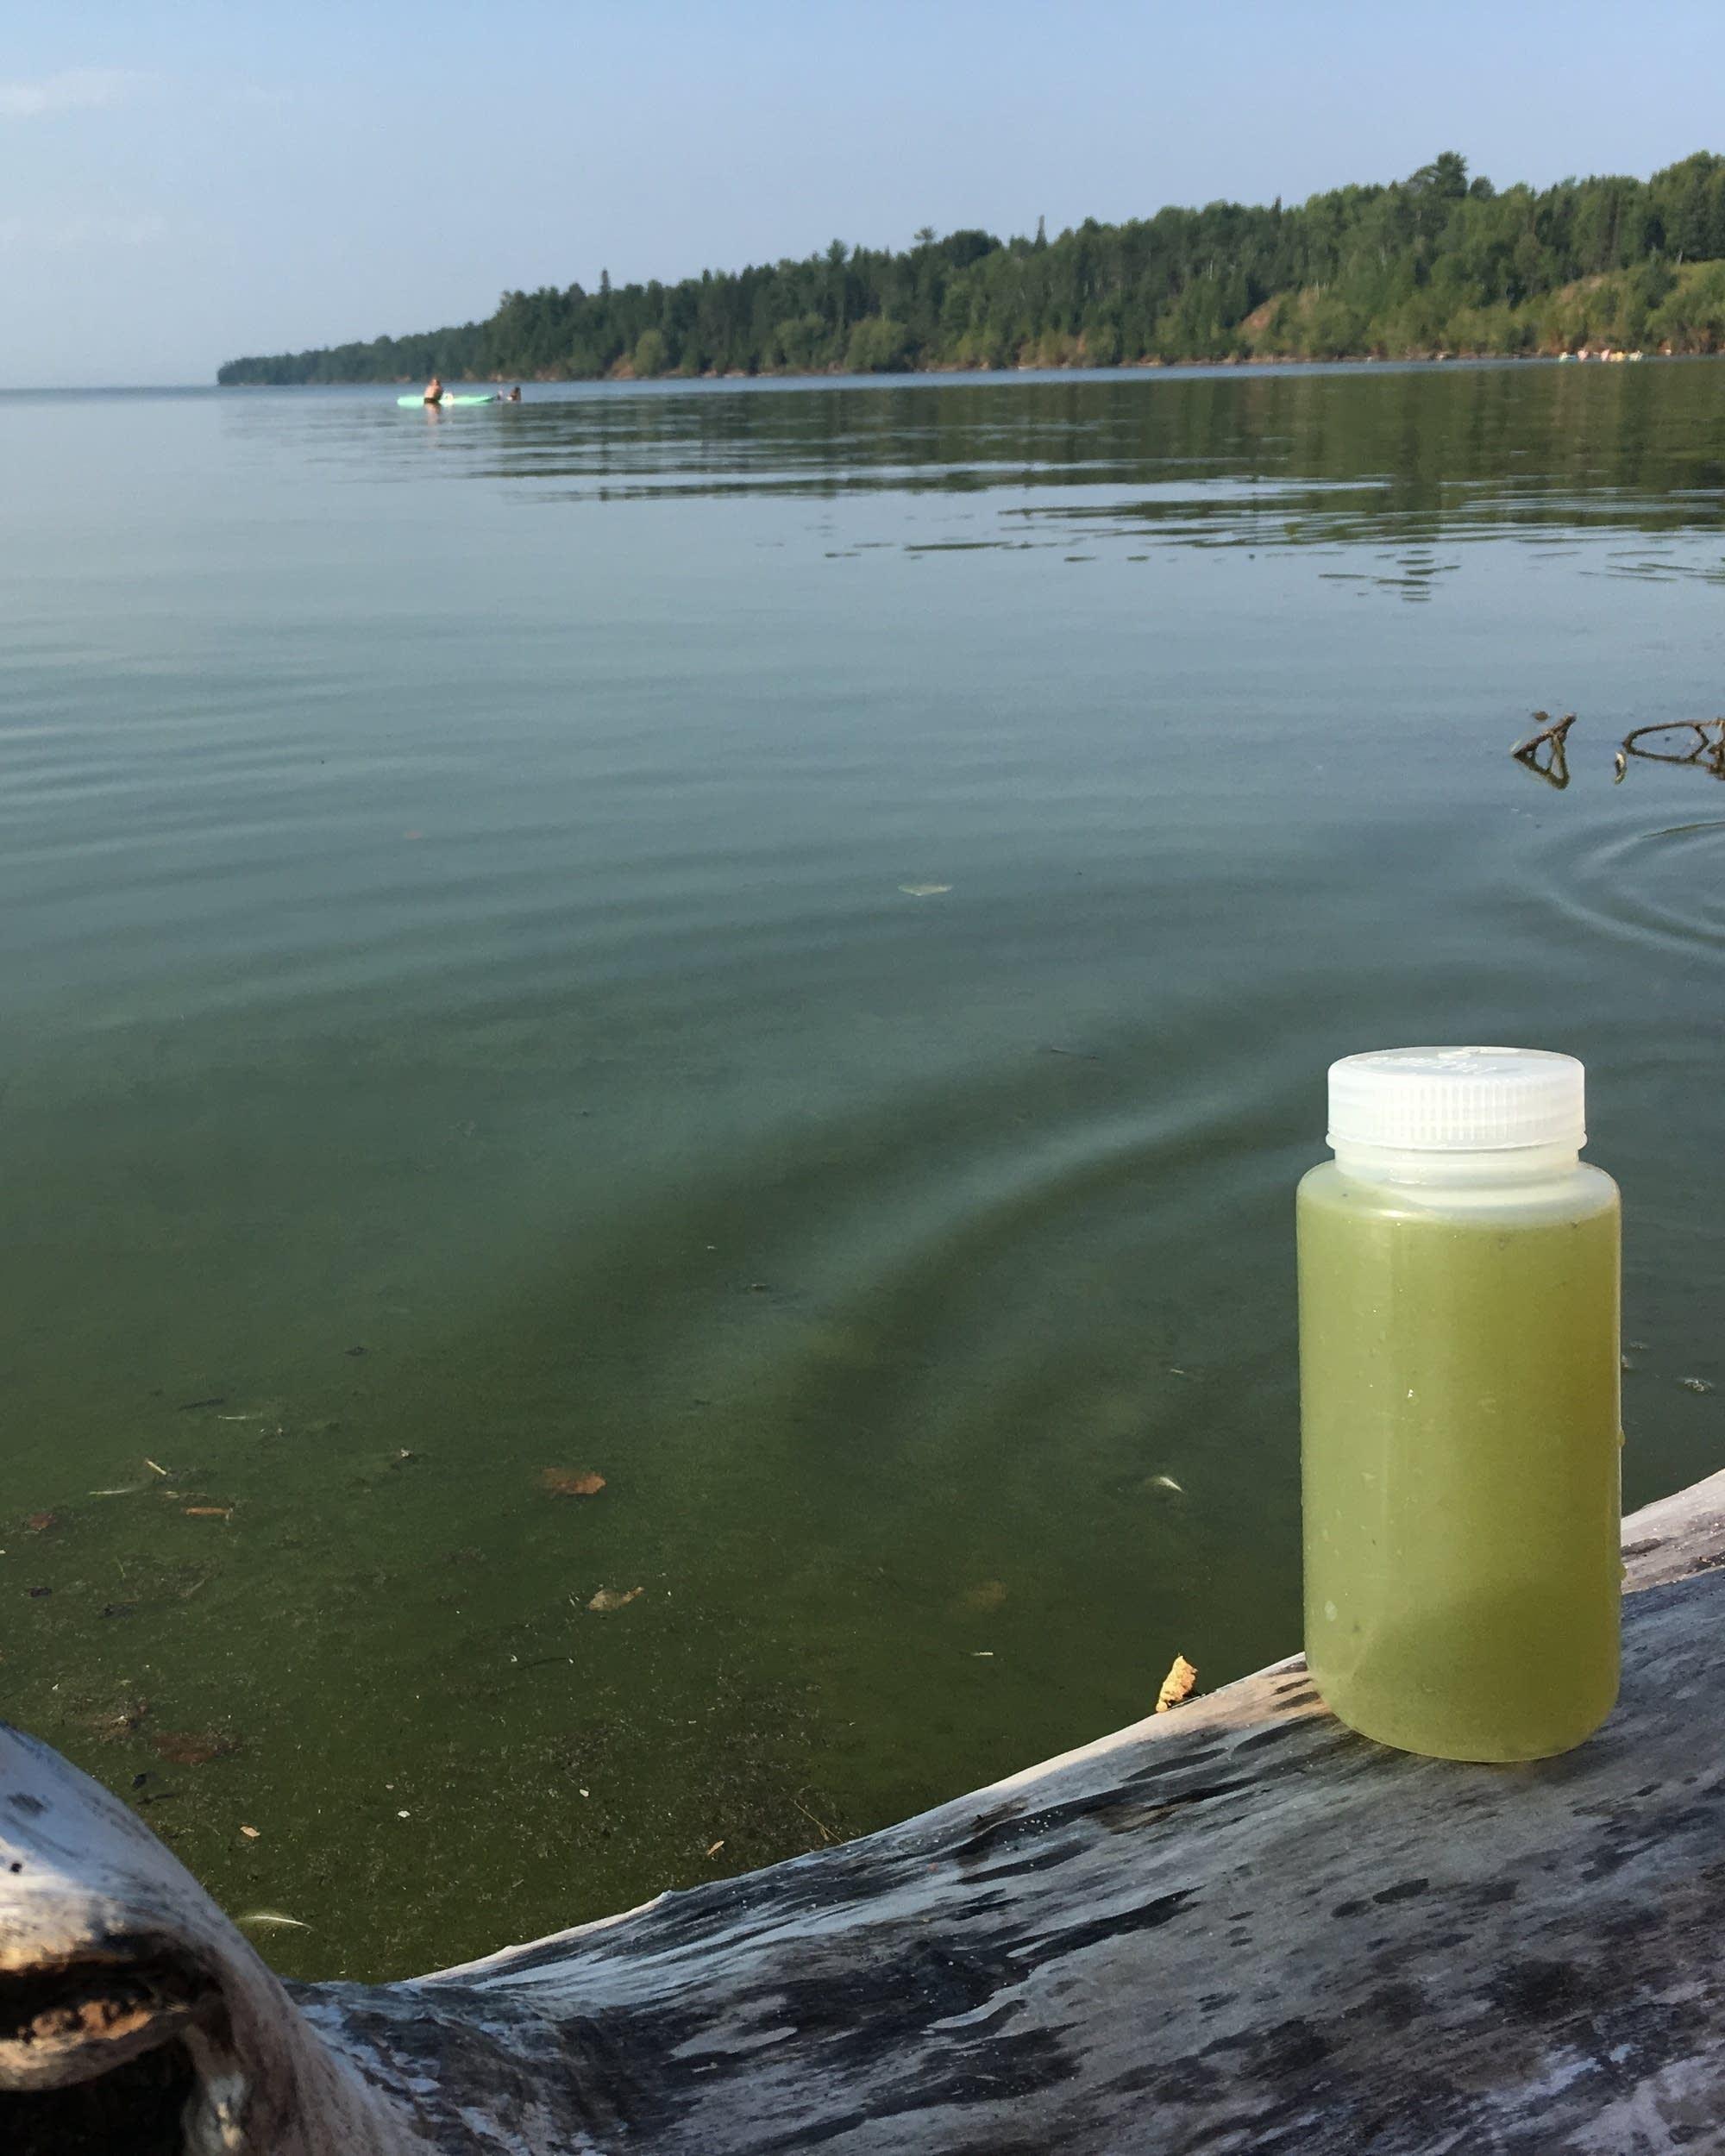 Scientists investigating 'unprecedented' algae bloom in Lake